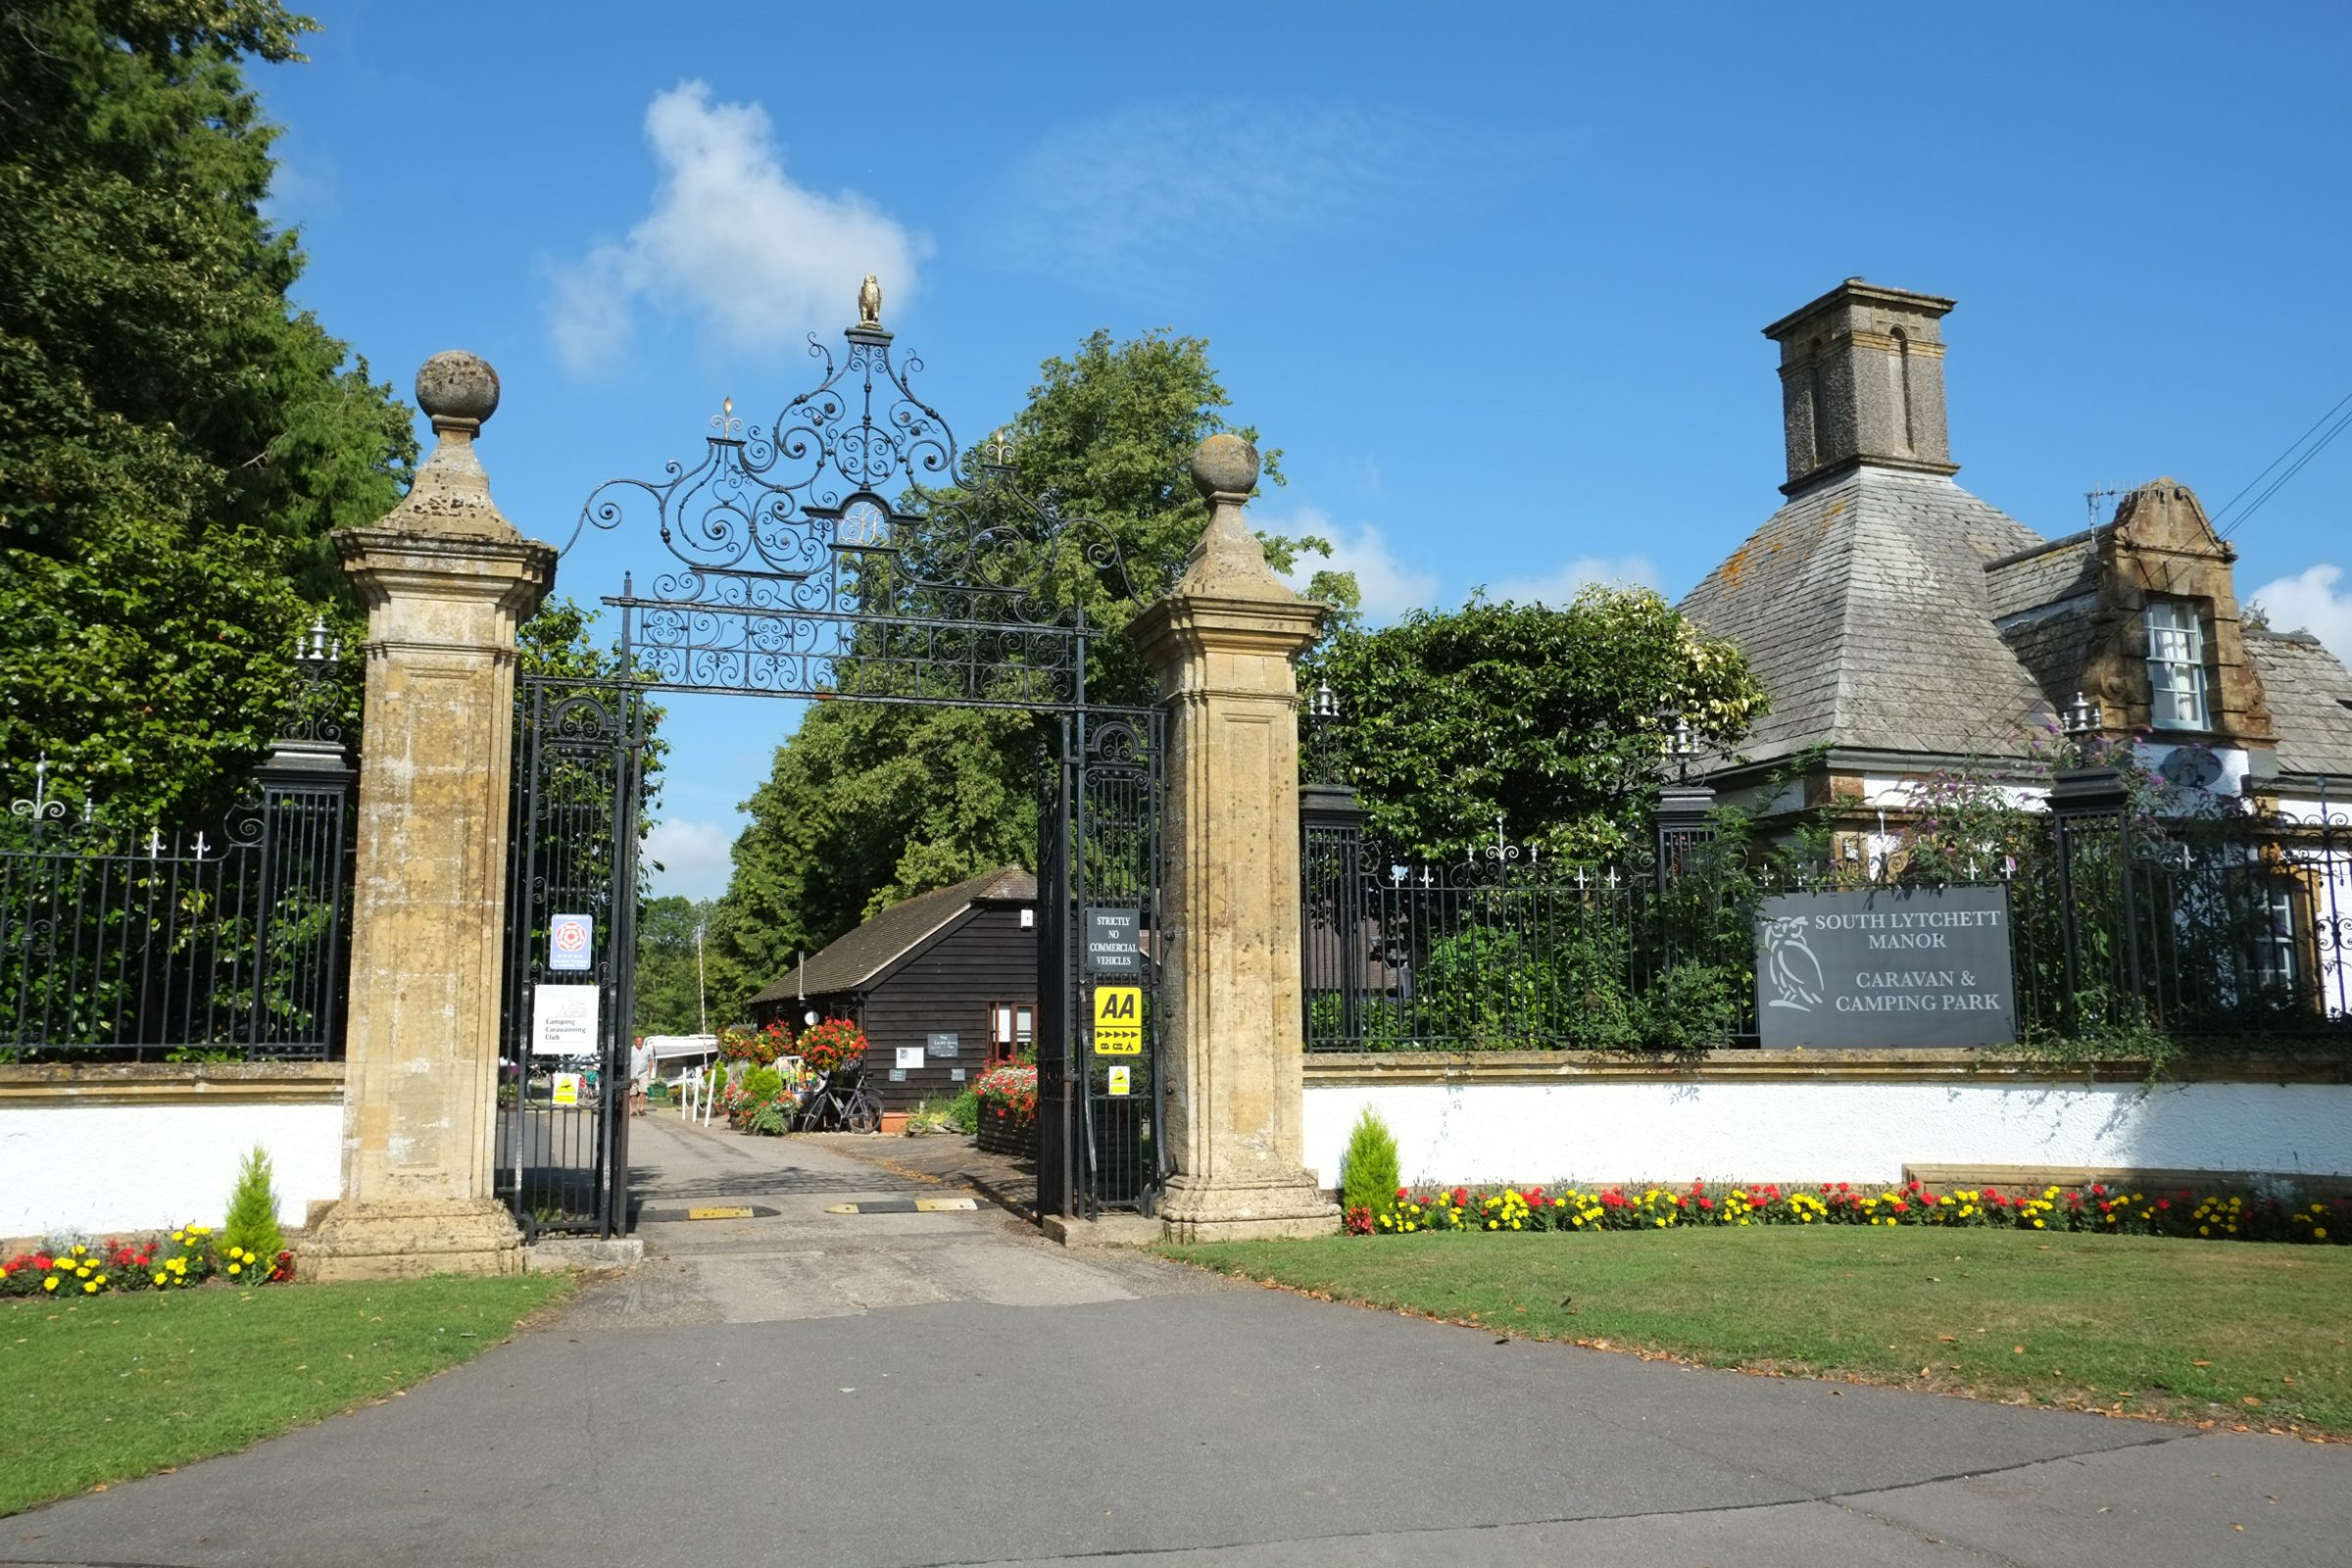 South Lytchett Manor front gates. 5 star camping in Dorset.